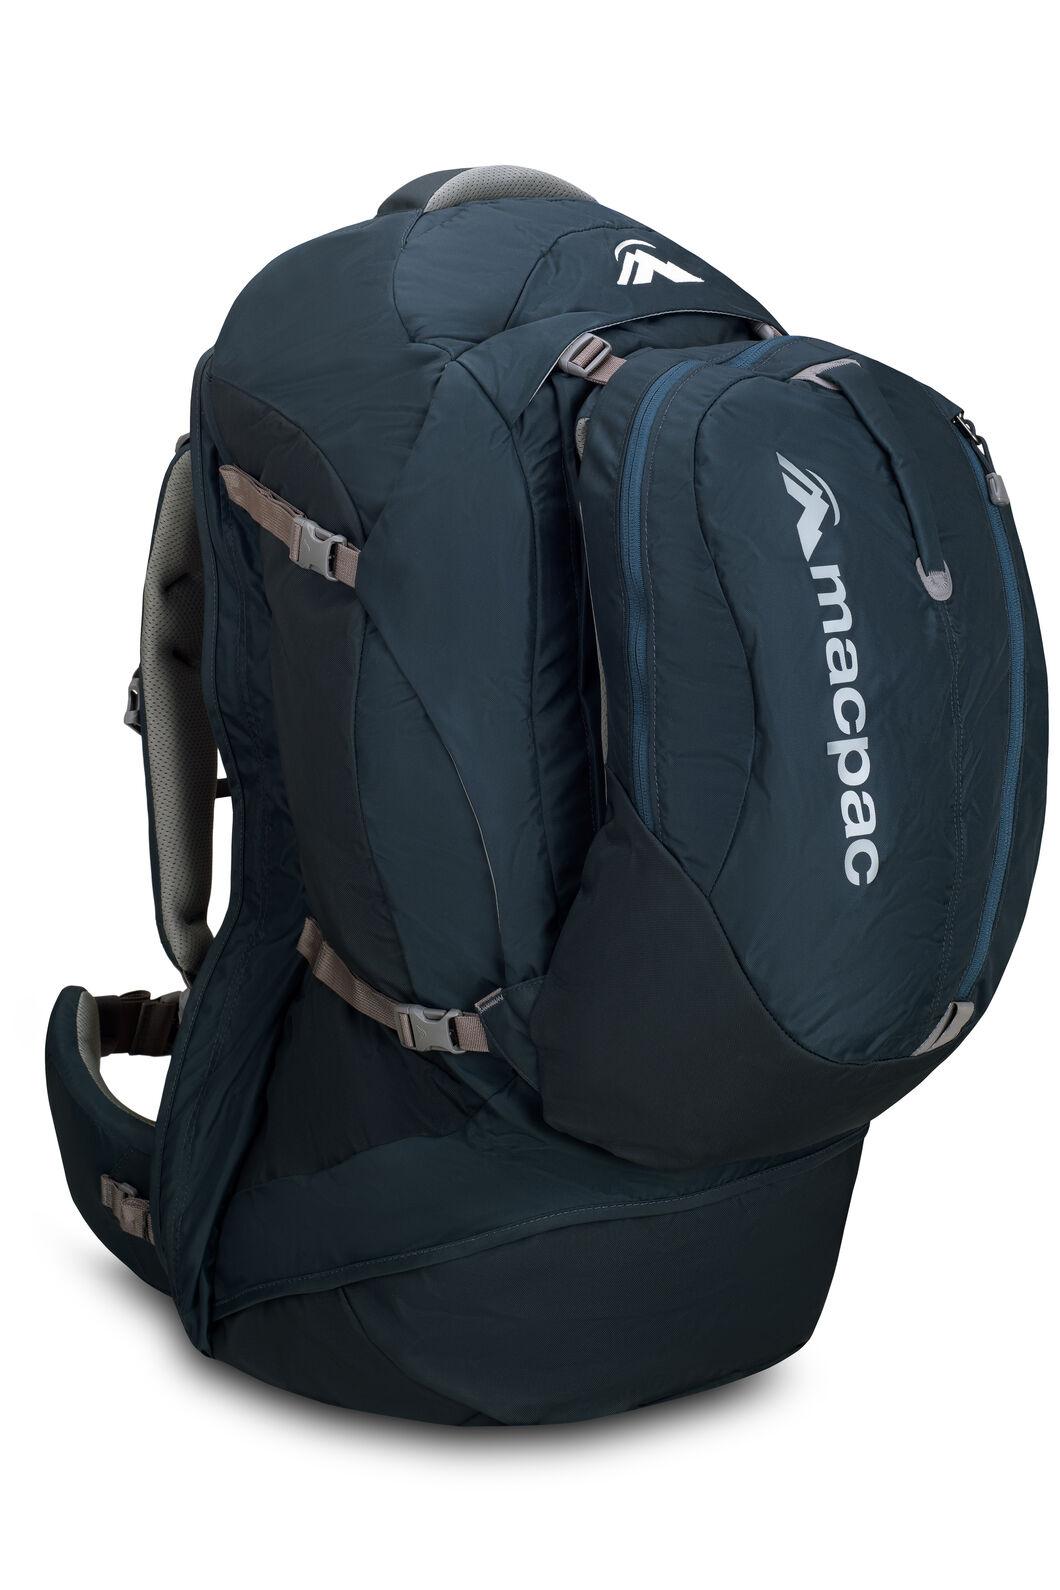 Macpac Orient Express 65L Travel Backpack, Carbon, hi-res